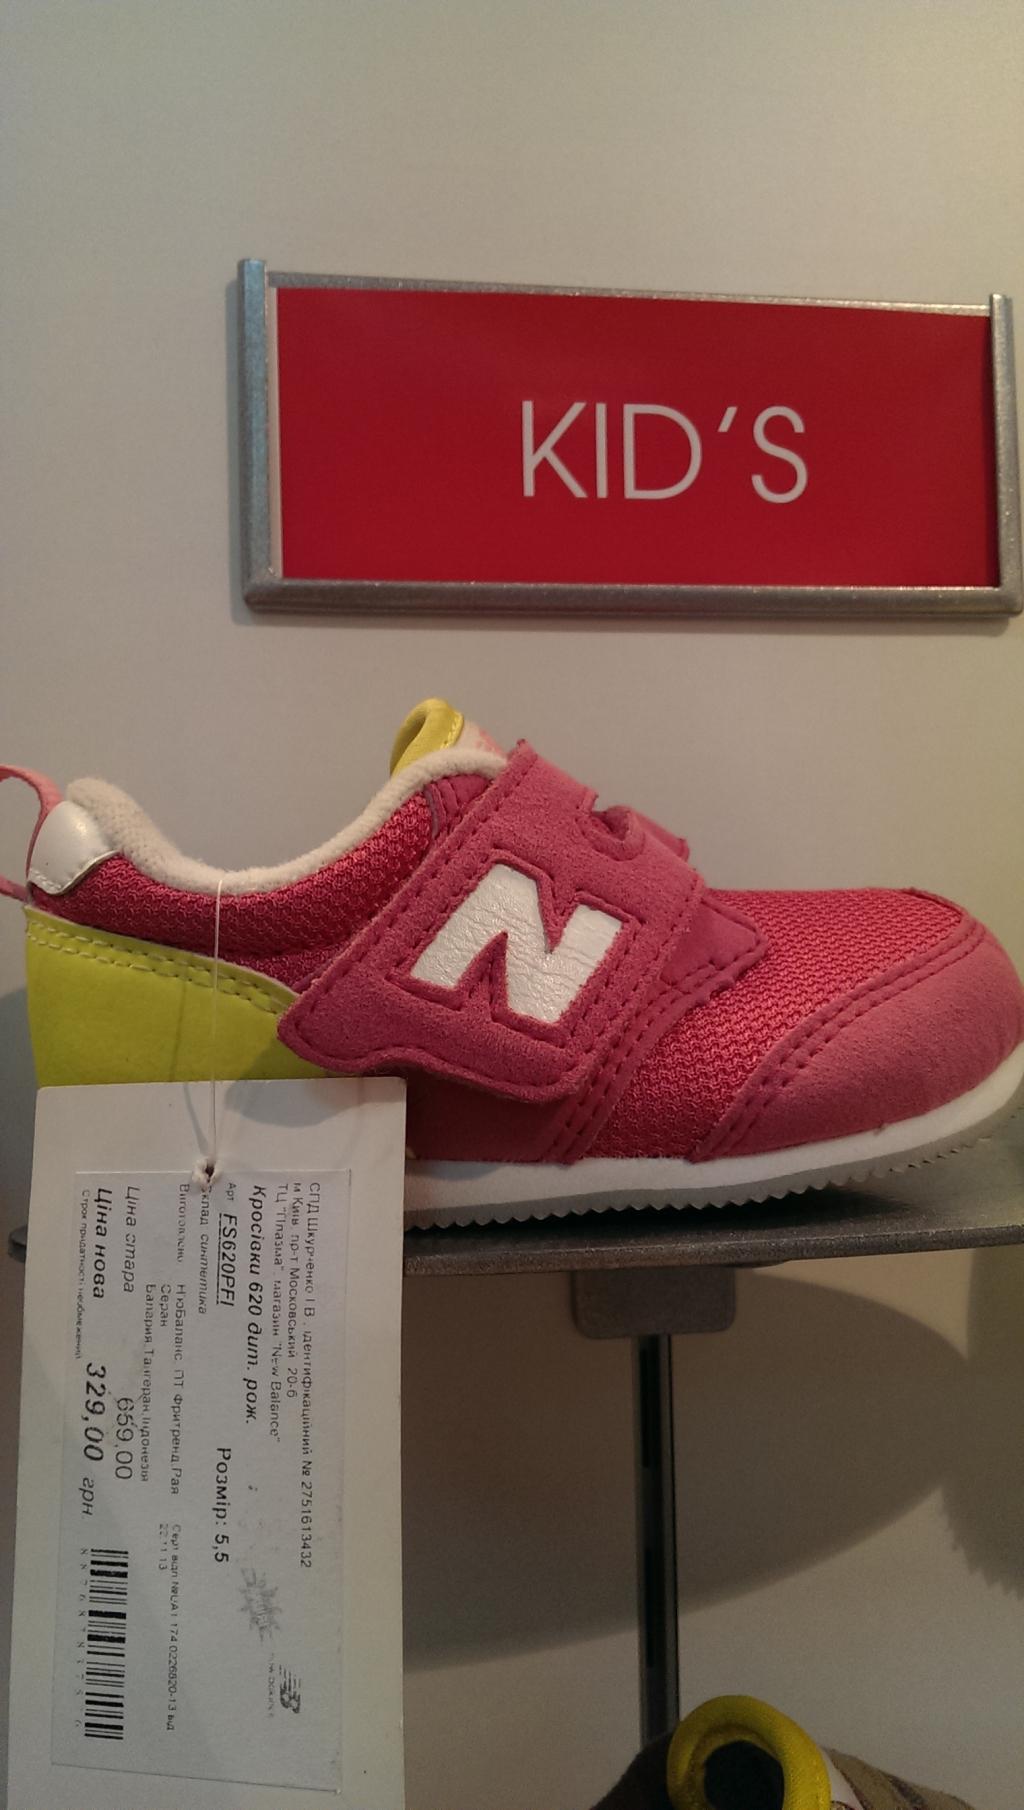 8e603bf3518b Скидка на детские кроссовки New Balance купить со скидкой   Плазма ...